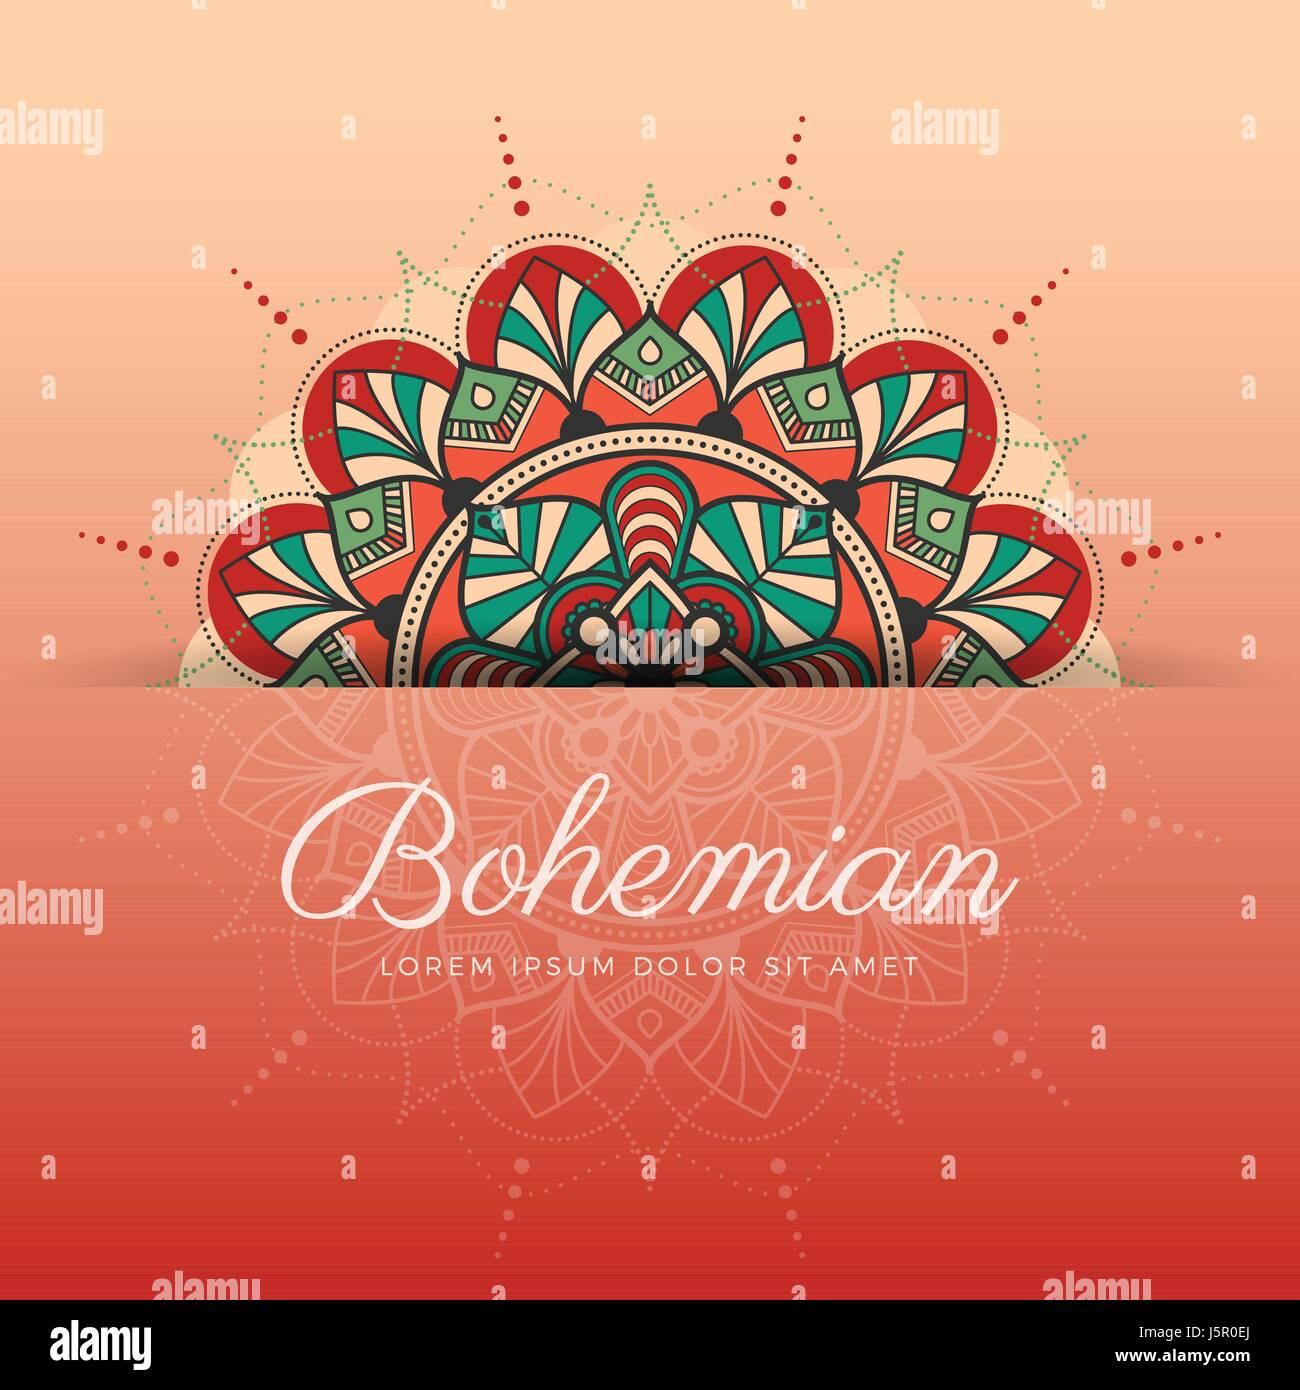 Beautiful henna mehndi mandala ornament design for background stock beautiful henna mehndi mandala ornament design for background greeting card invitation tattoo yoga and spa symbol vector illustration stopboris Images